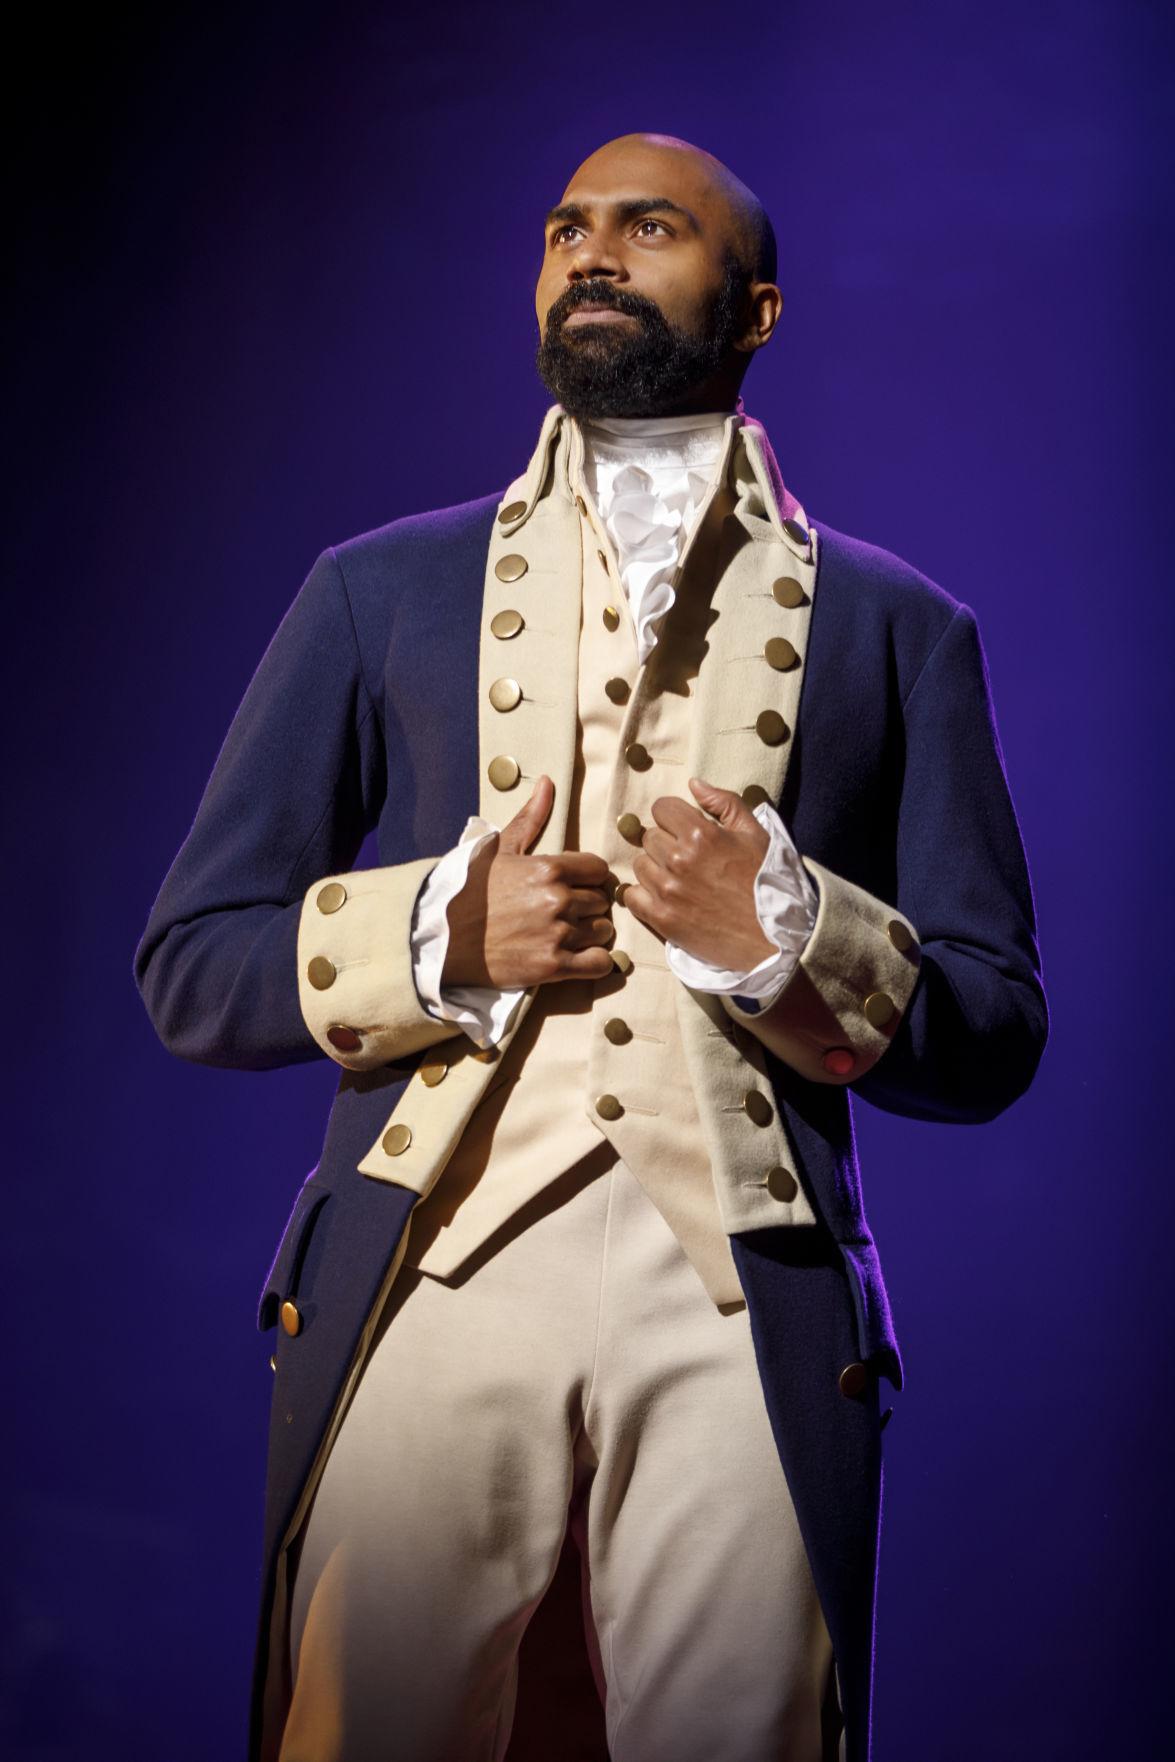 Actor Nik Walker gets his big shot in 'Hamilton,' now coming